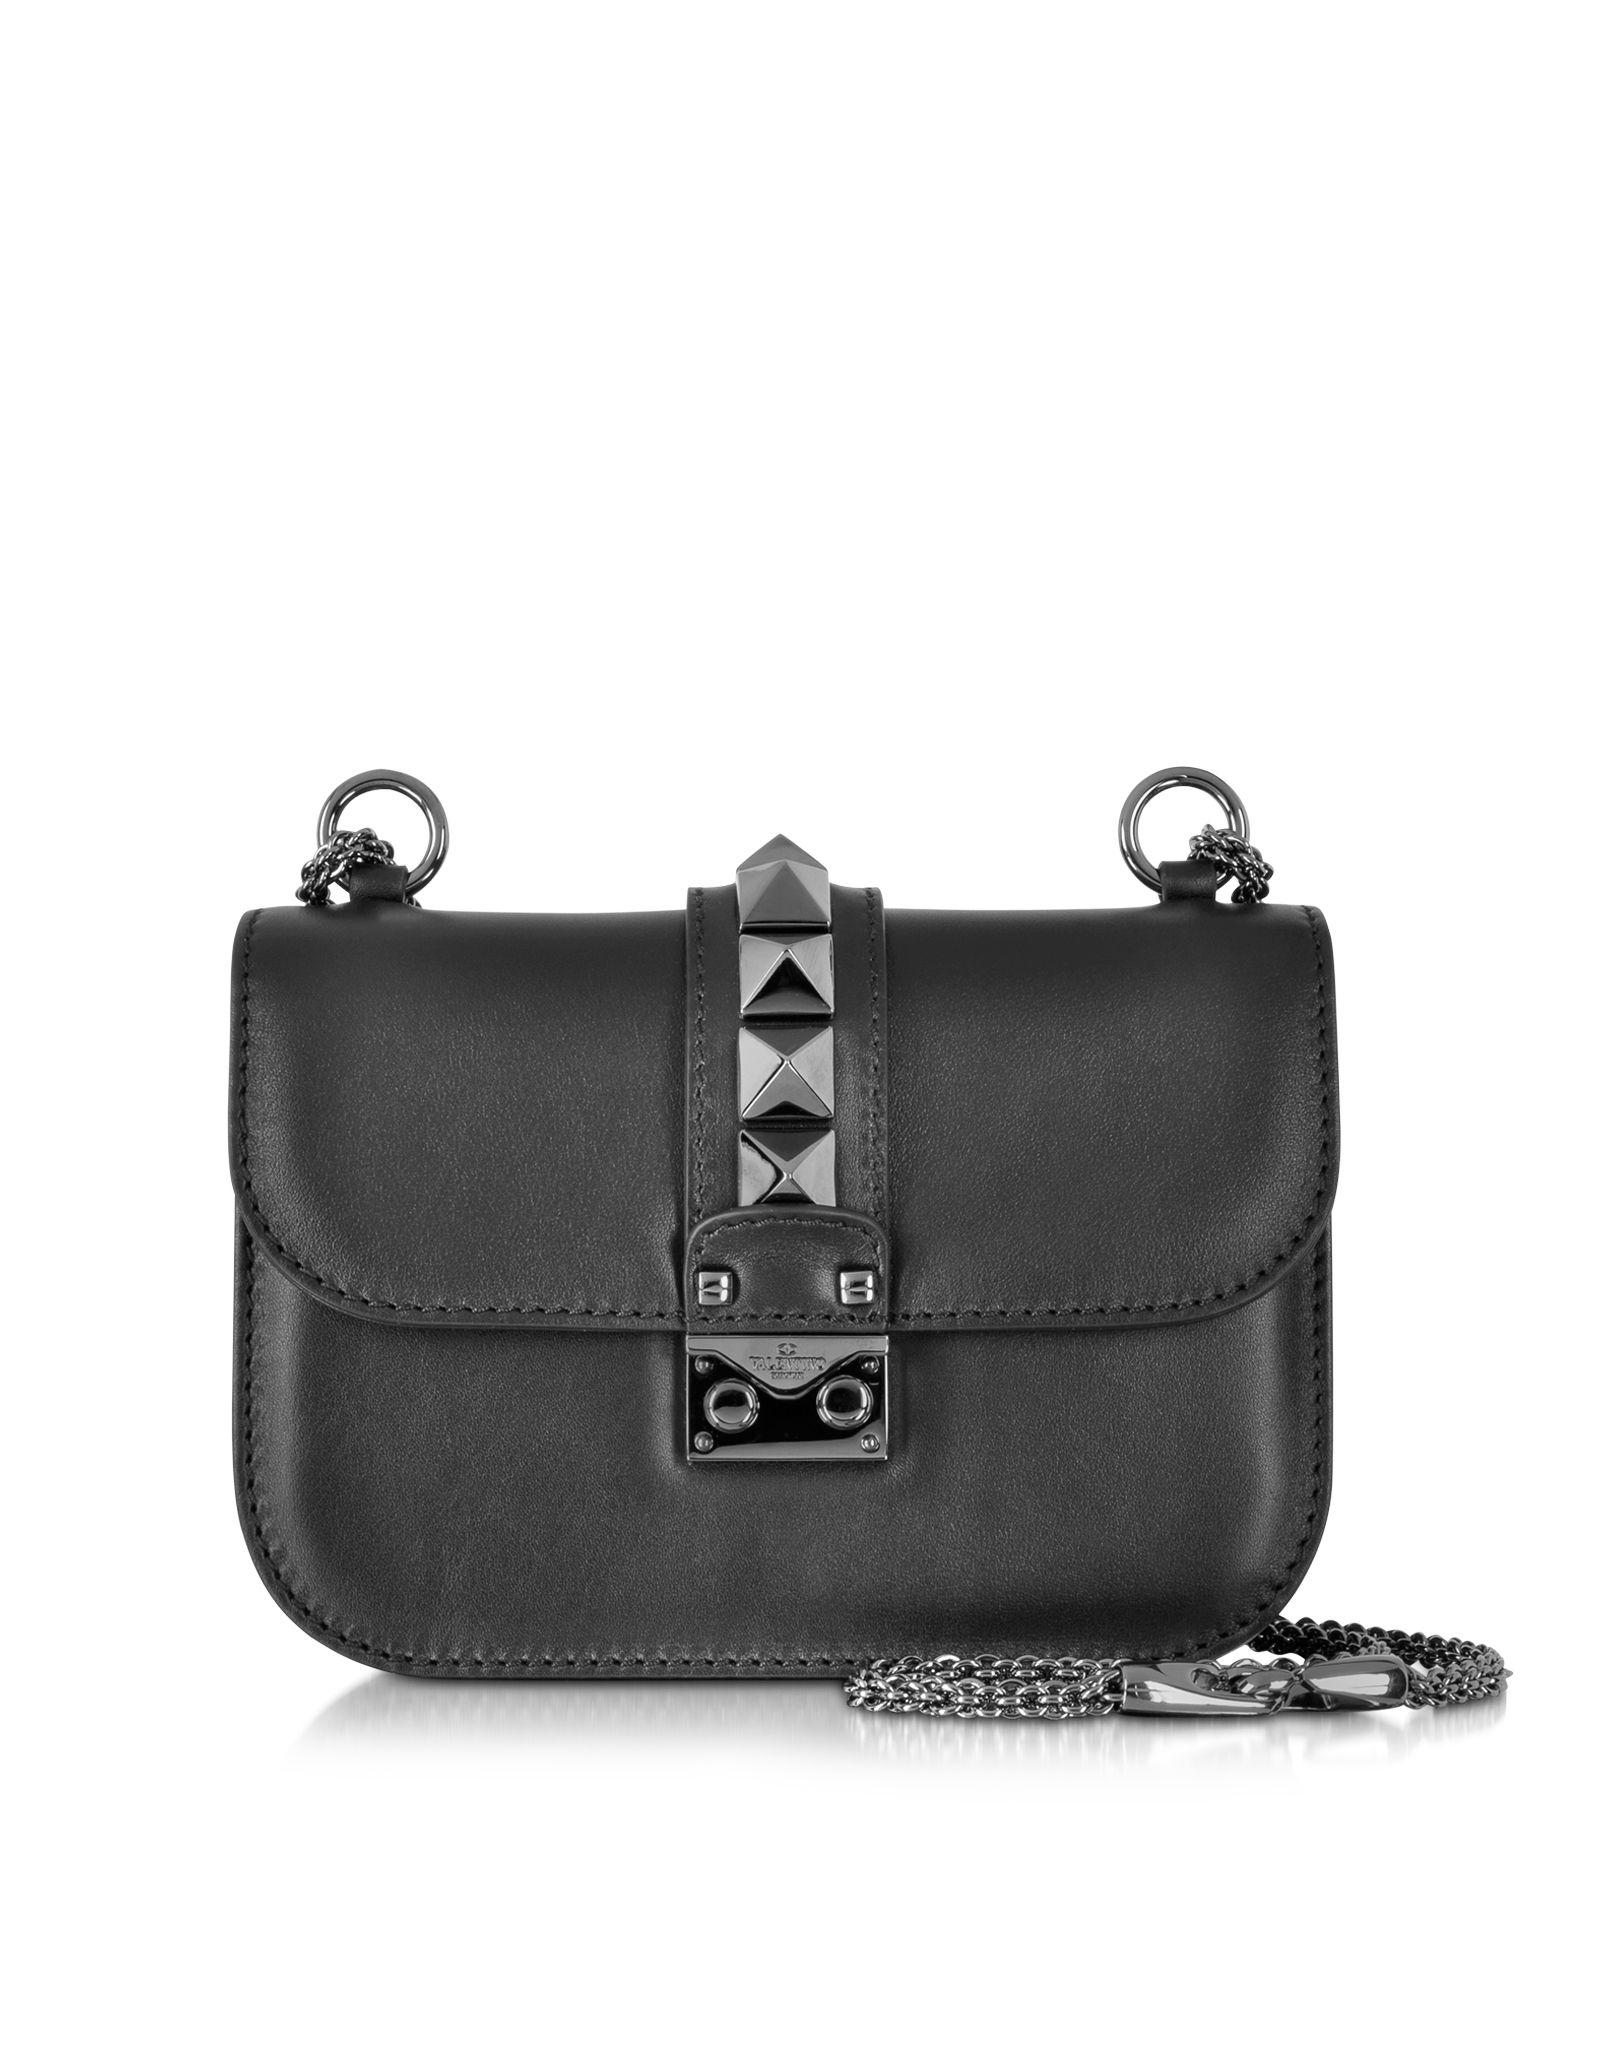 febe50b983e8 Valentino Noir Small Chain Shoulder Bag at FORZIERI